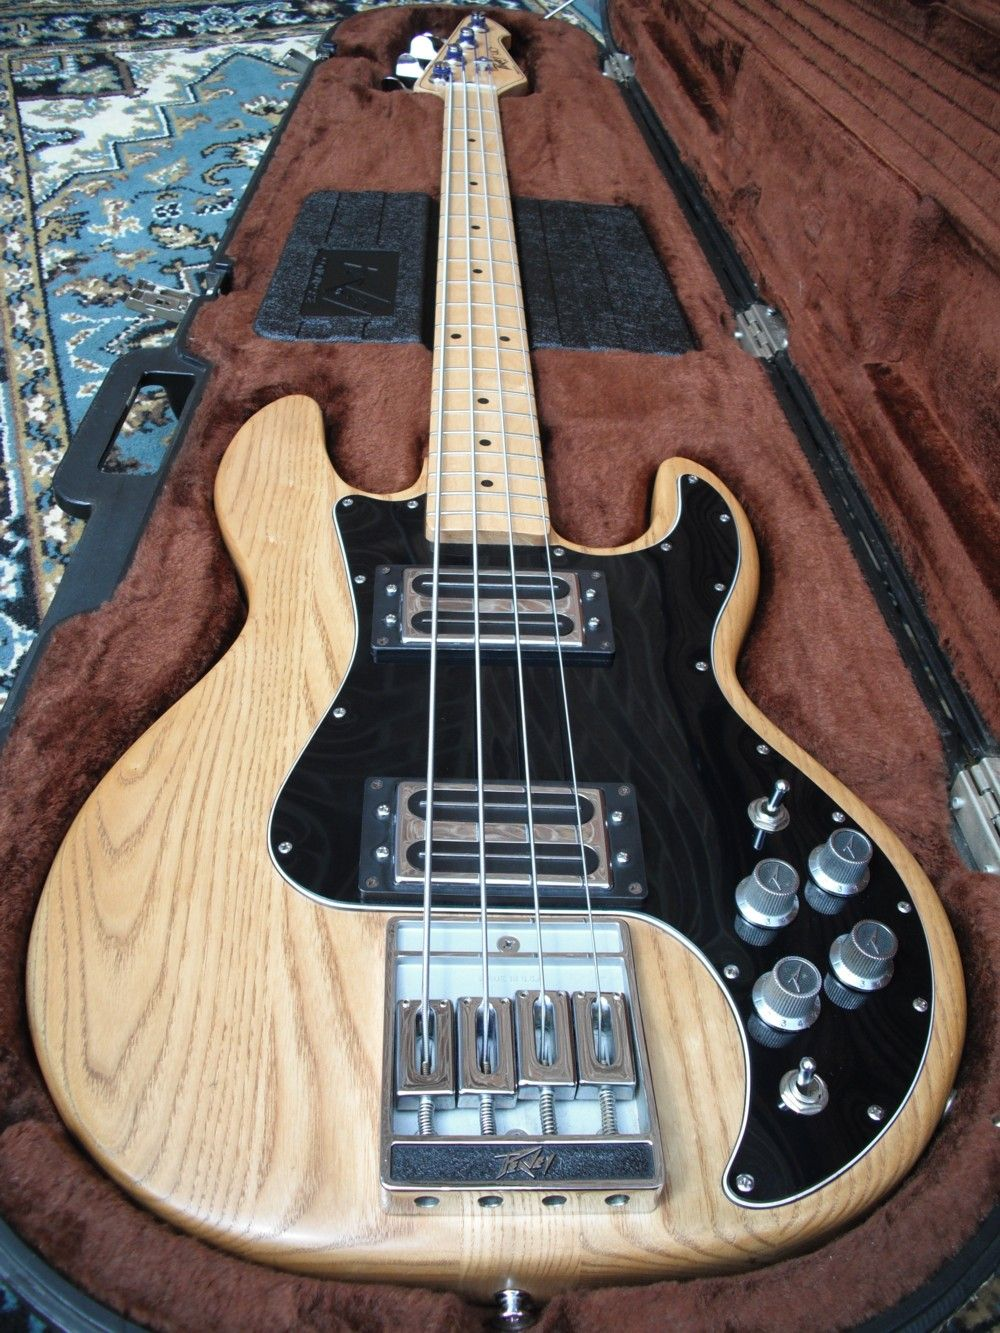 Top Cheap Electric Bass Guitars : best 25 cheap bass guitar ideas on pinterest electric guitar and amp chris squire and used ~ Vivirlamusica.com Haus und Dekorationen